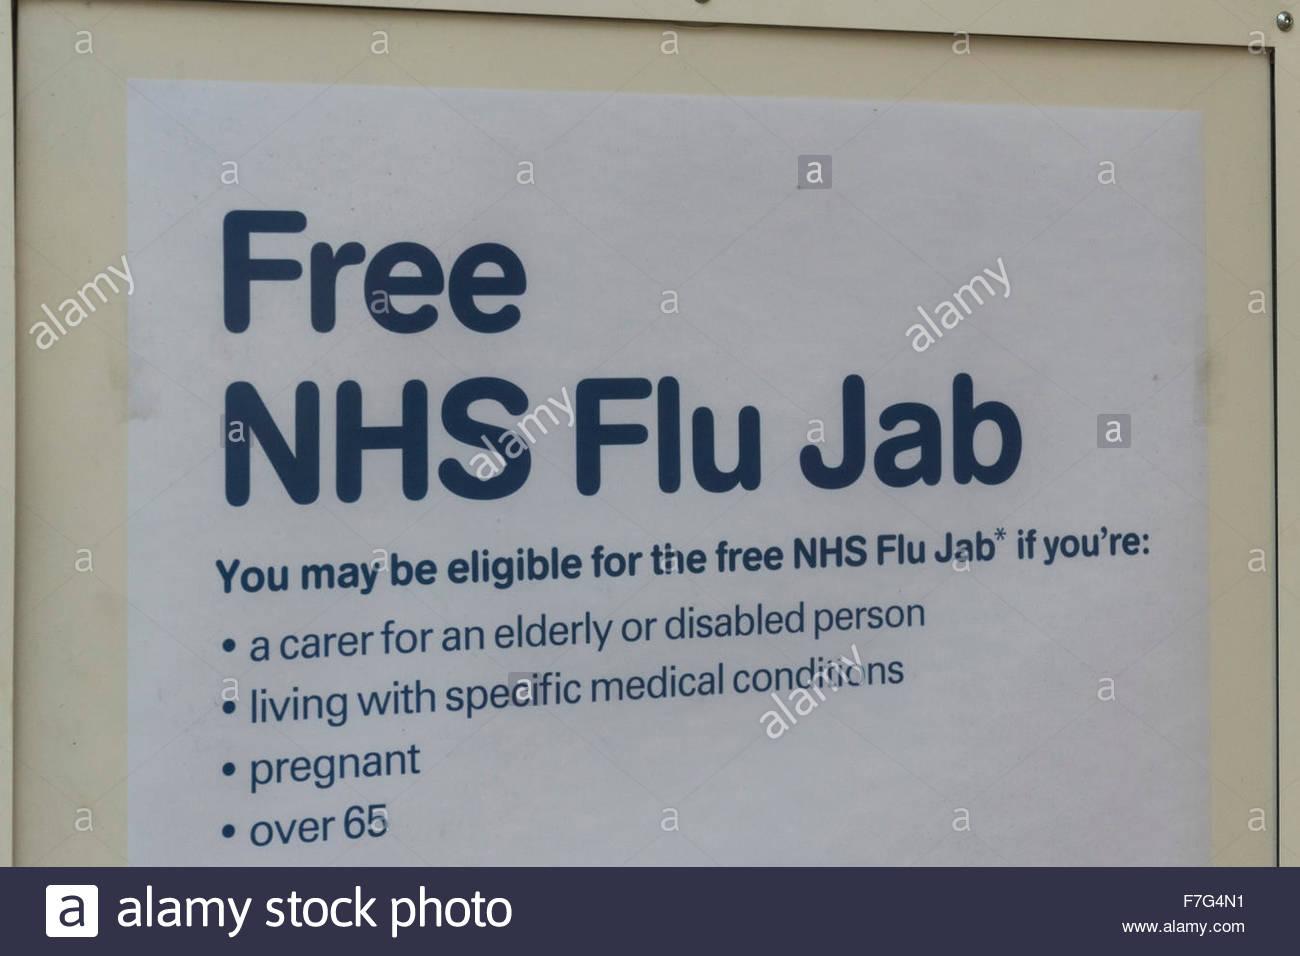 Sign for free NHS Flu Jab - Stock Image